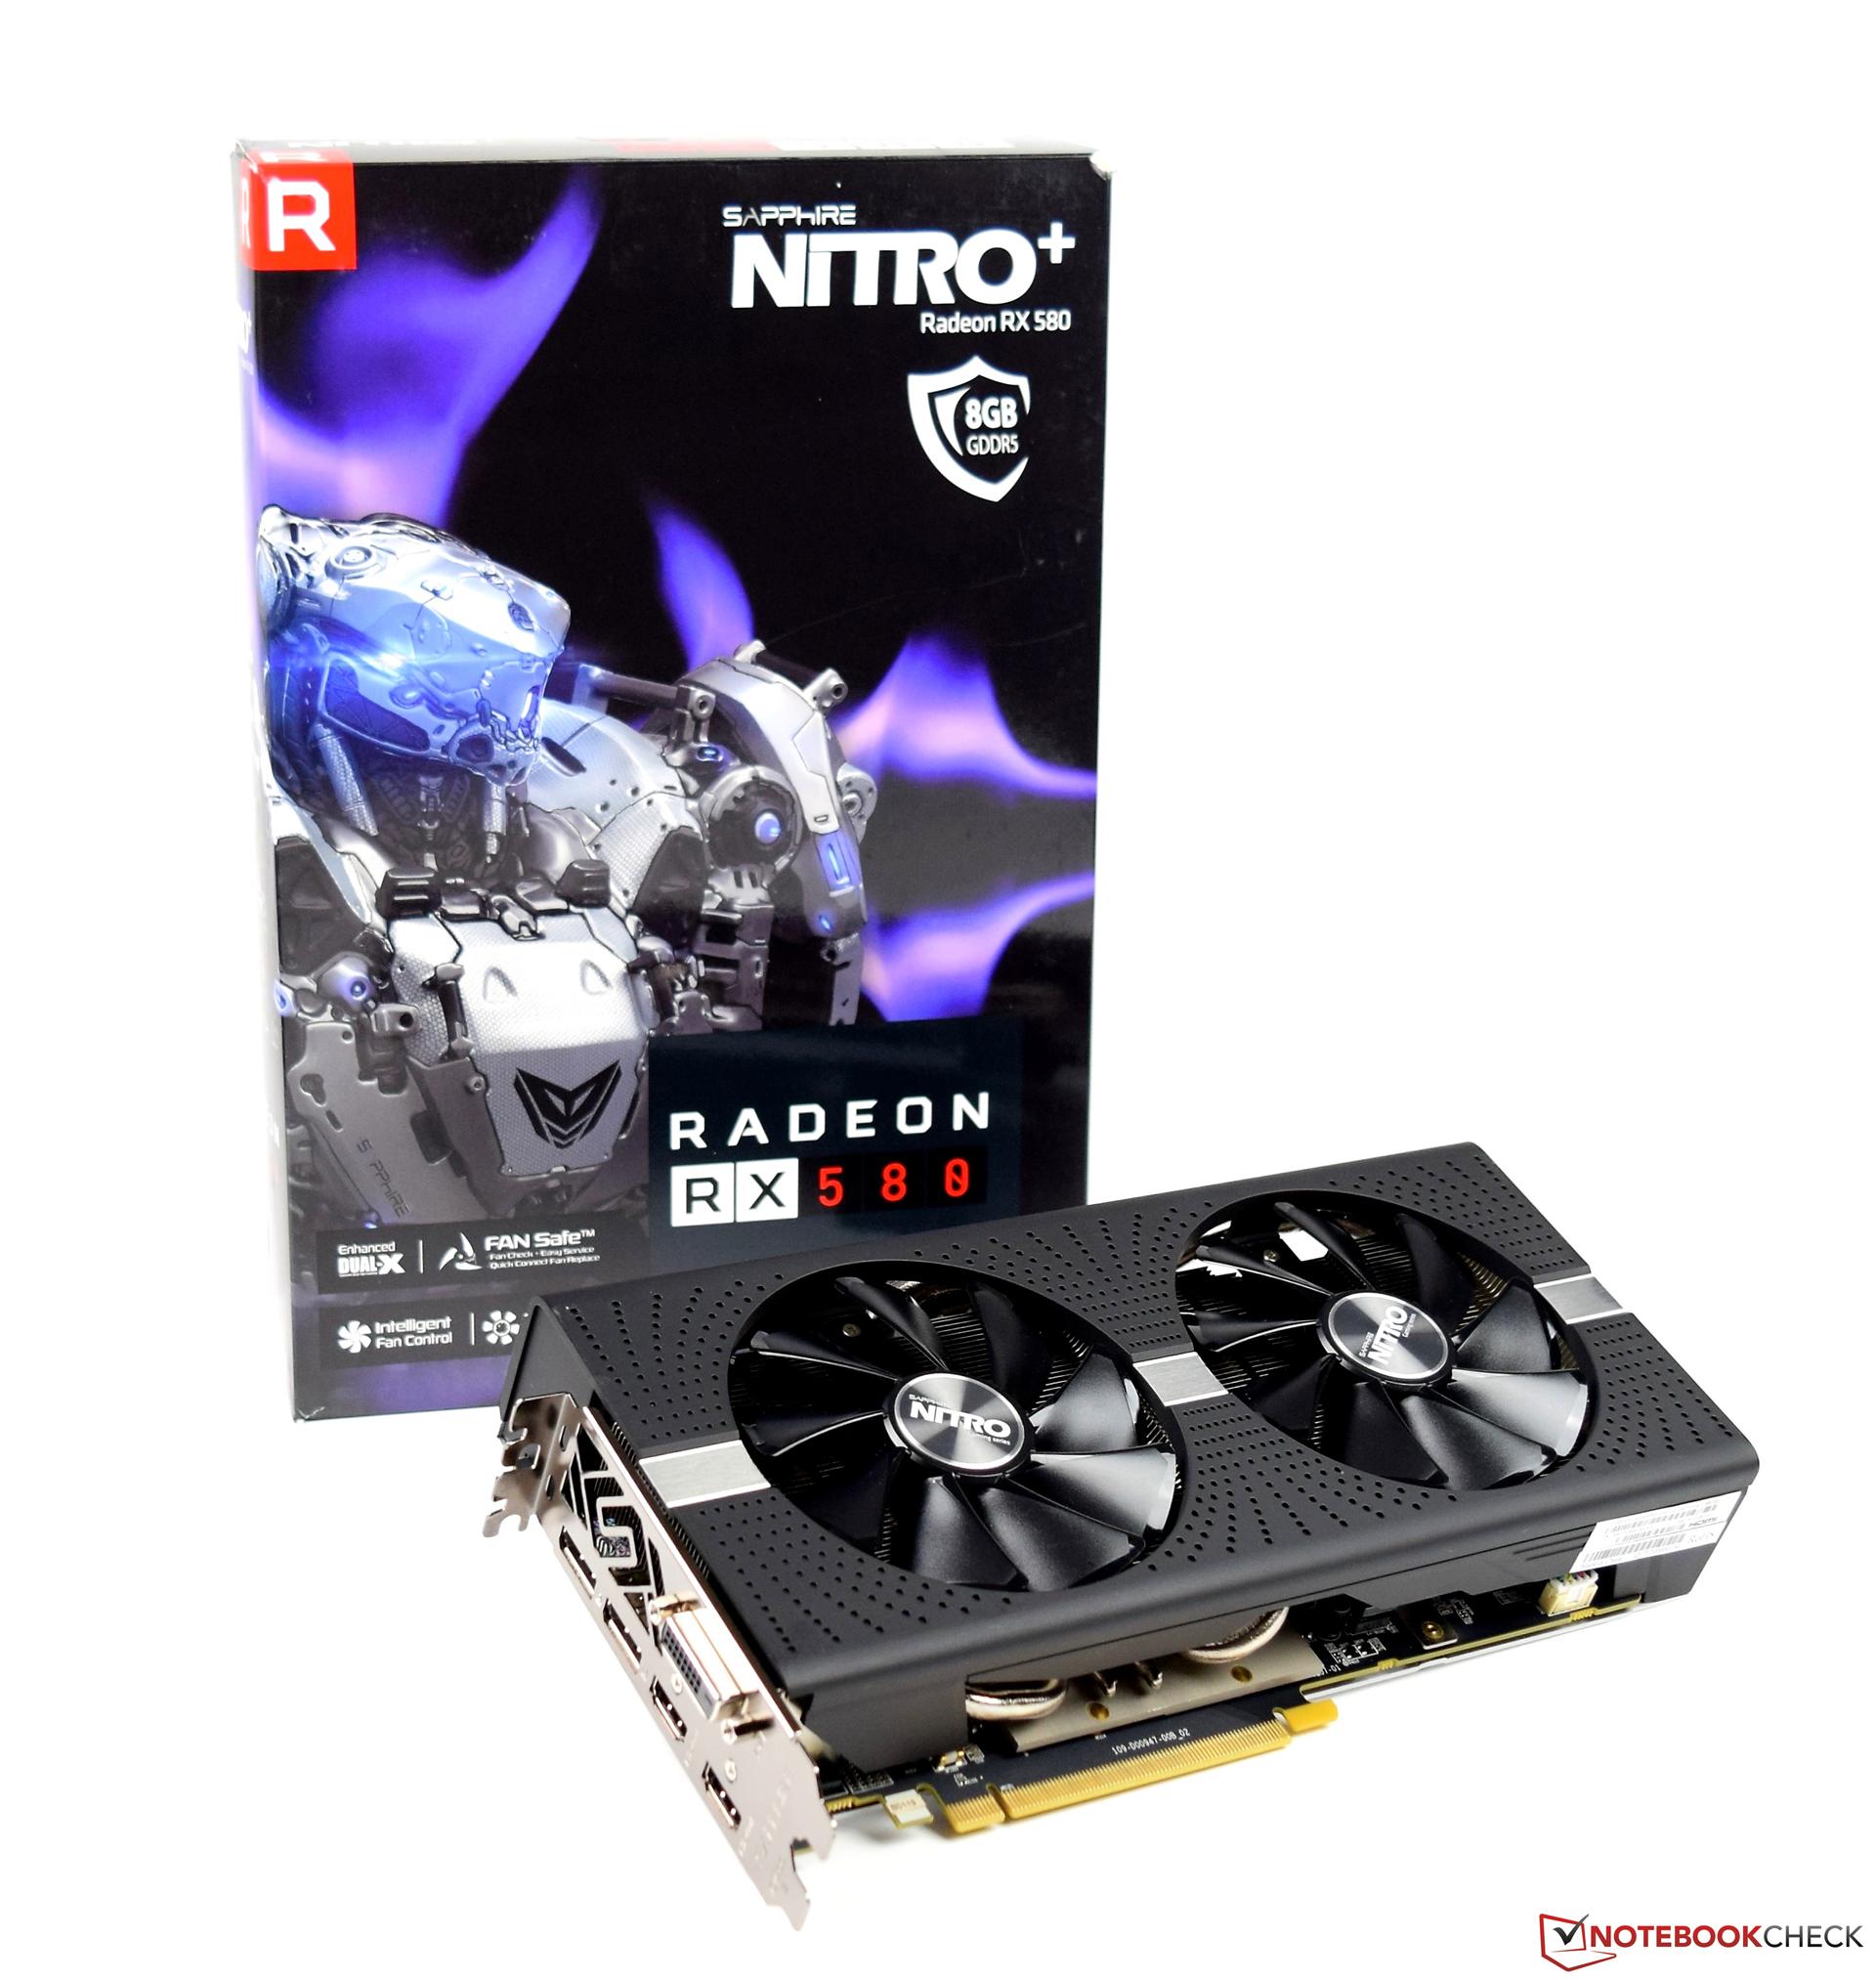 Sapphire NITRO Radeon RX 580 8GD5 Graphics Card